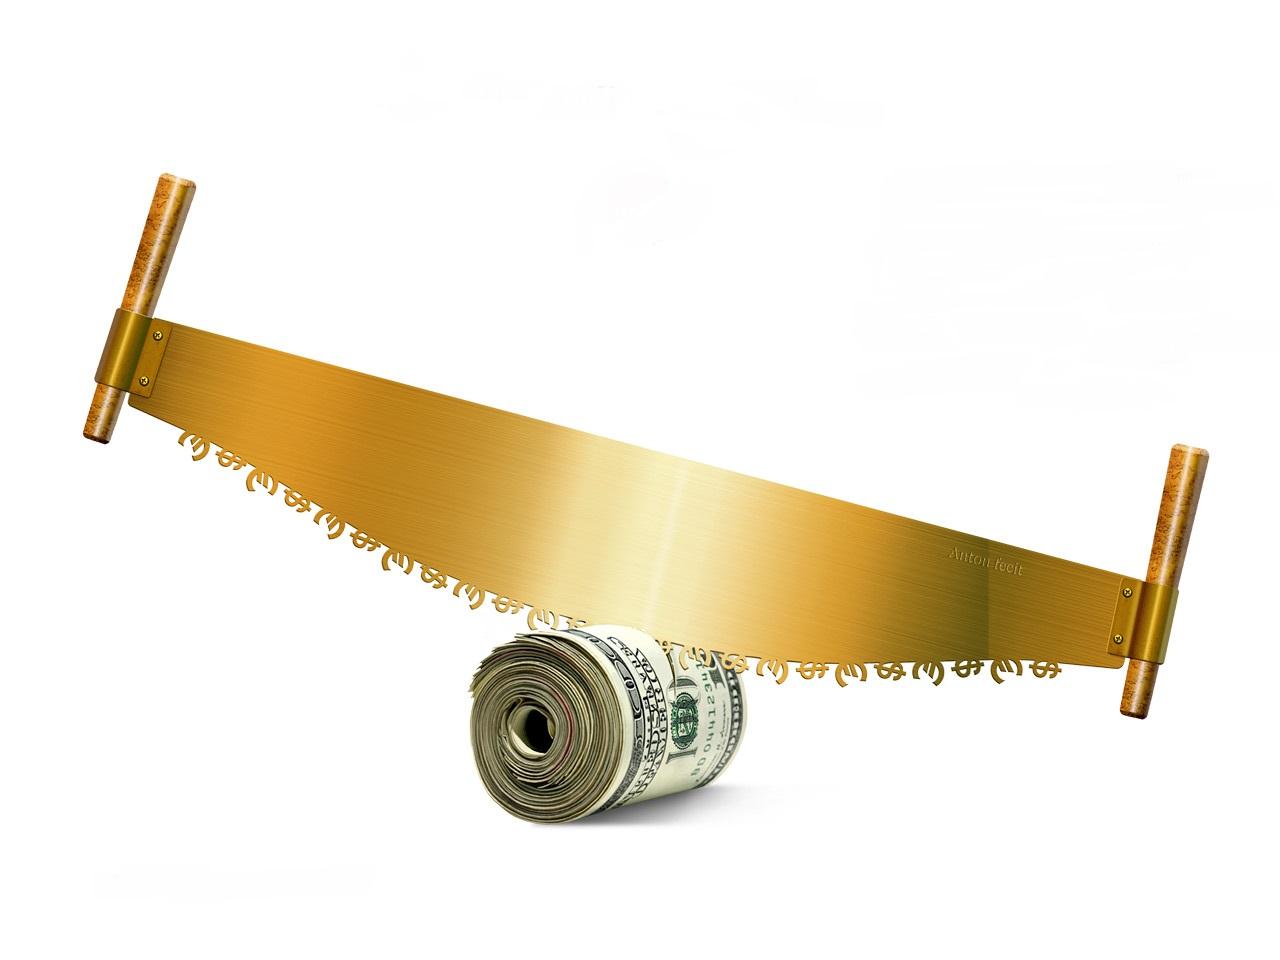 За копейки продают страну: размен Украины на траши от МВФ